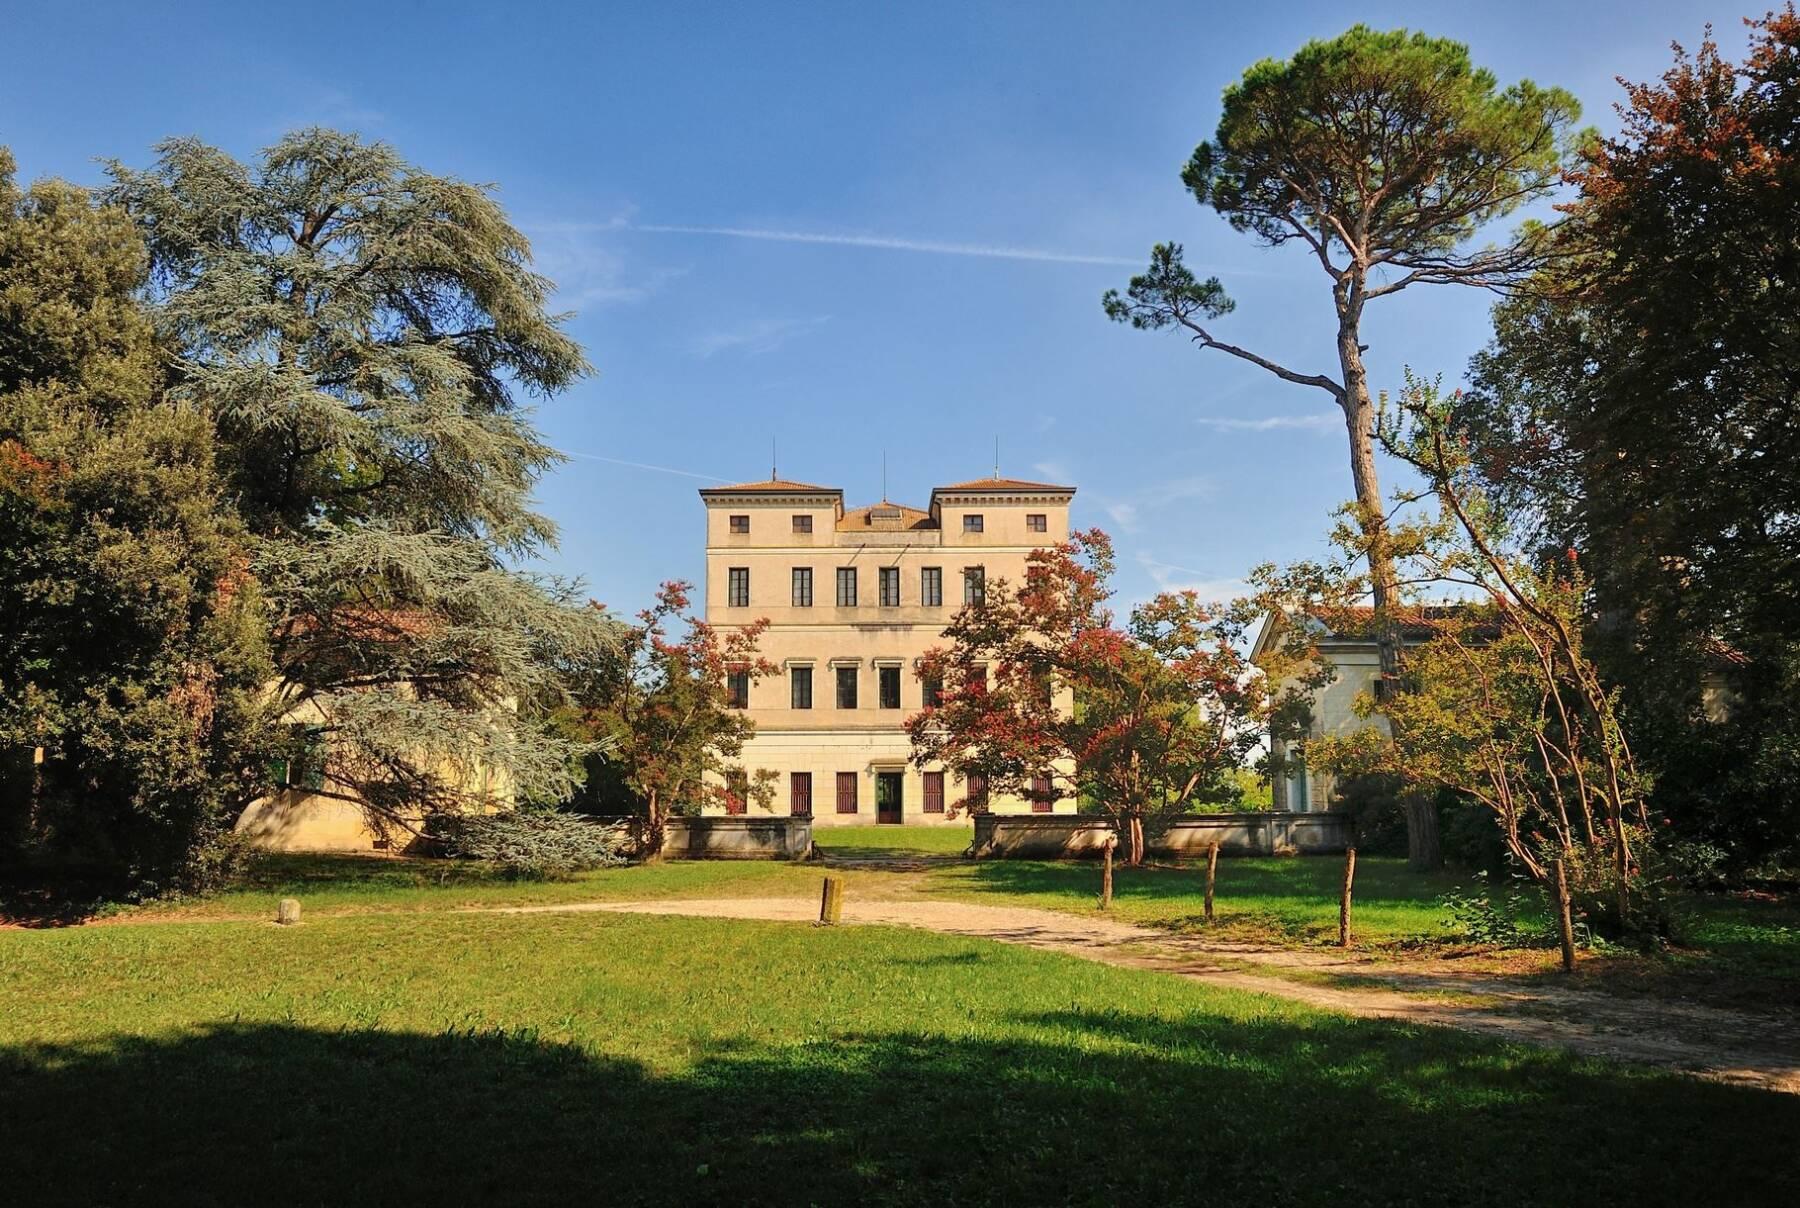 Villa Papafava